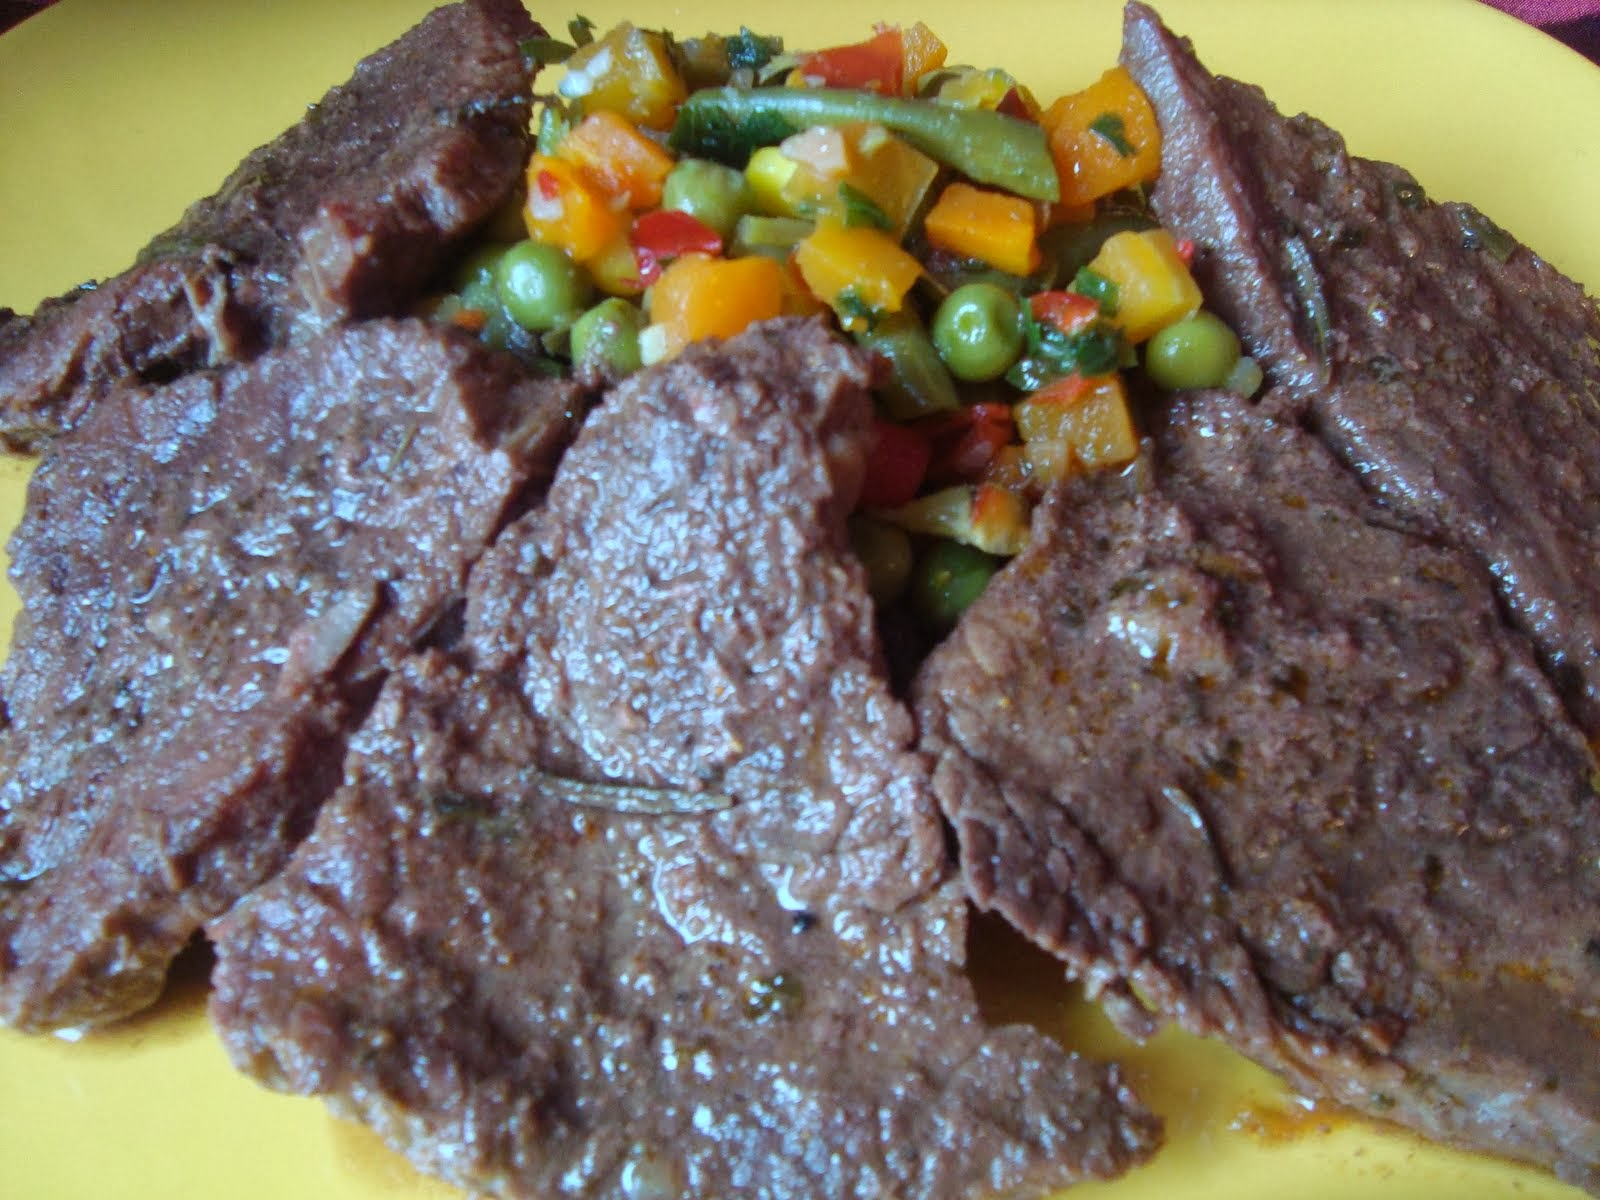 http://www.caietulcuretete.com/2011/01/pulpa-de-vitel-la-tava.html